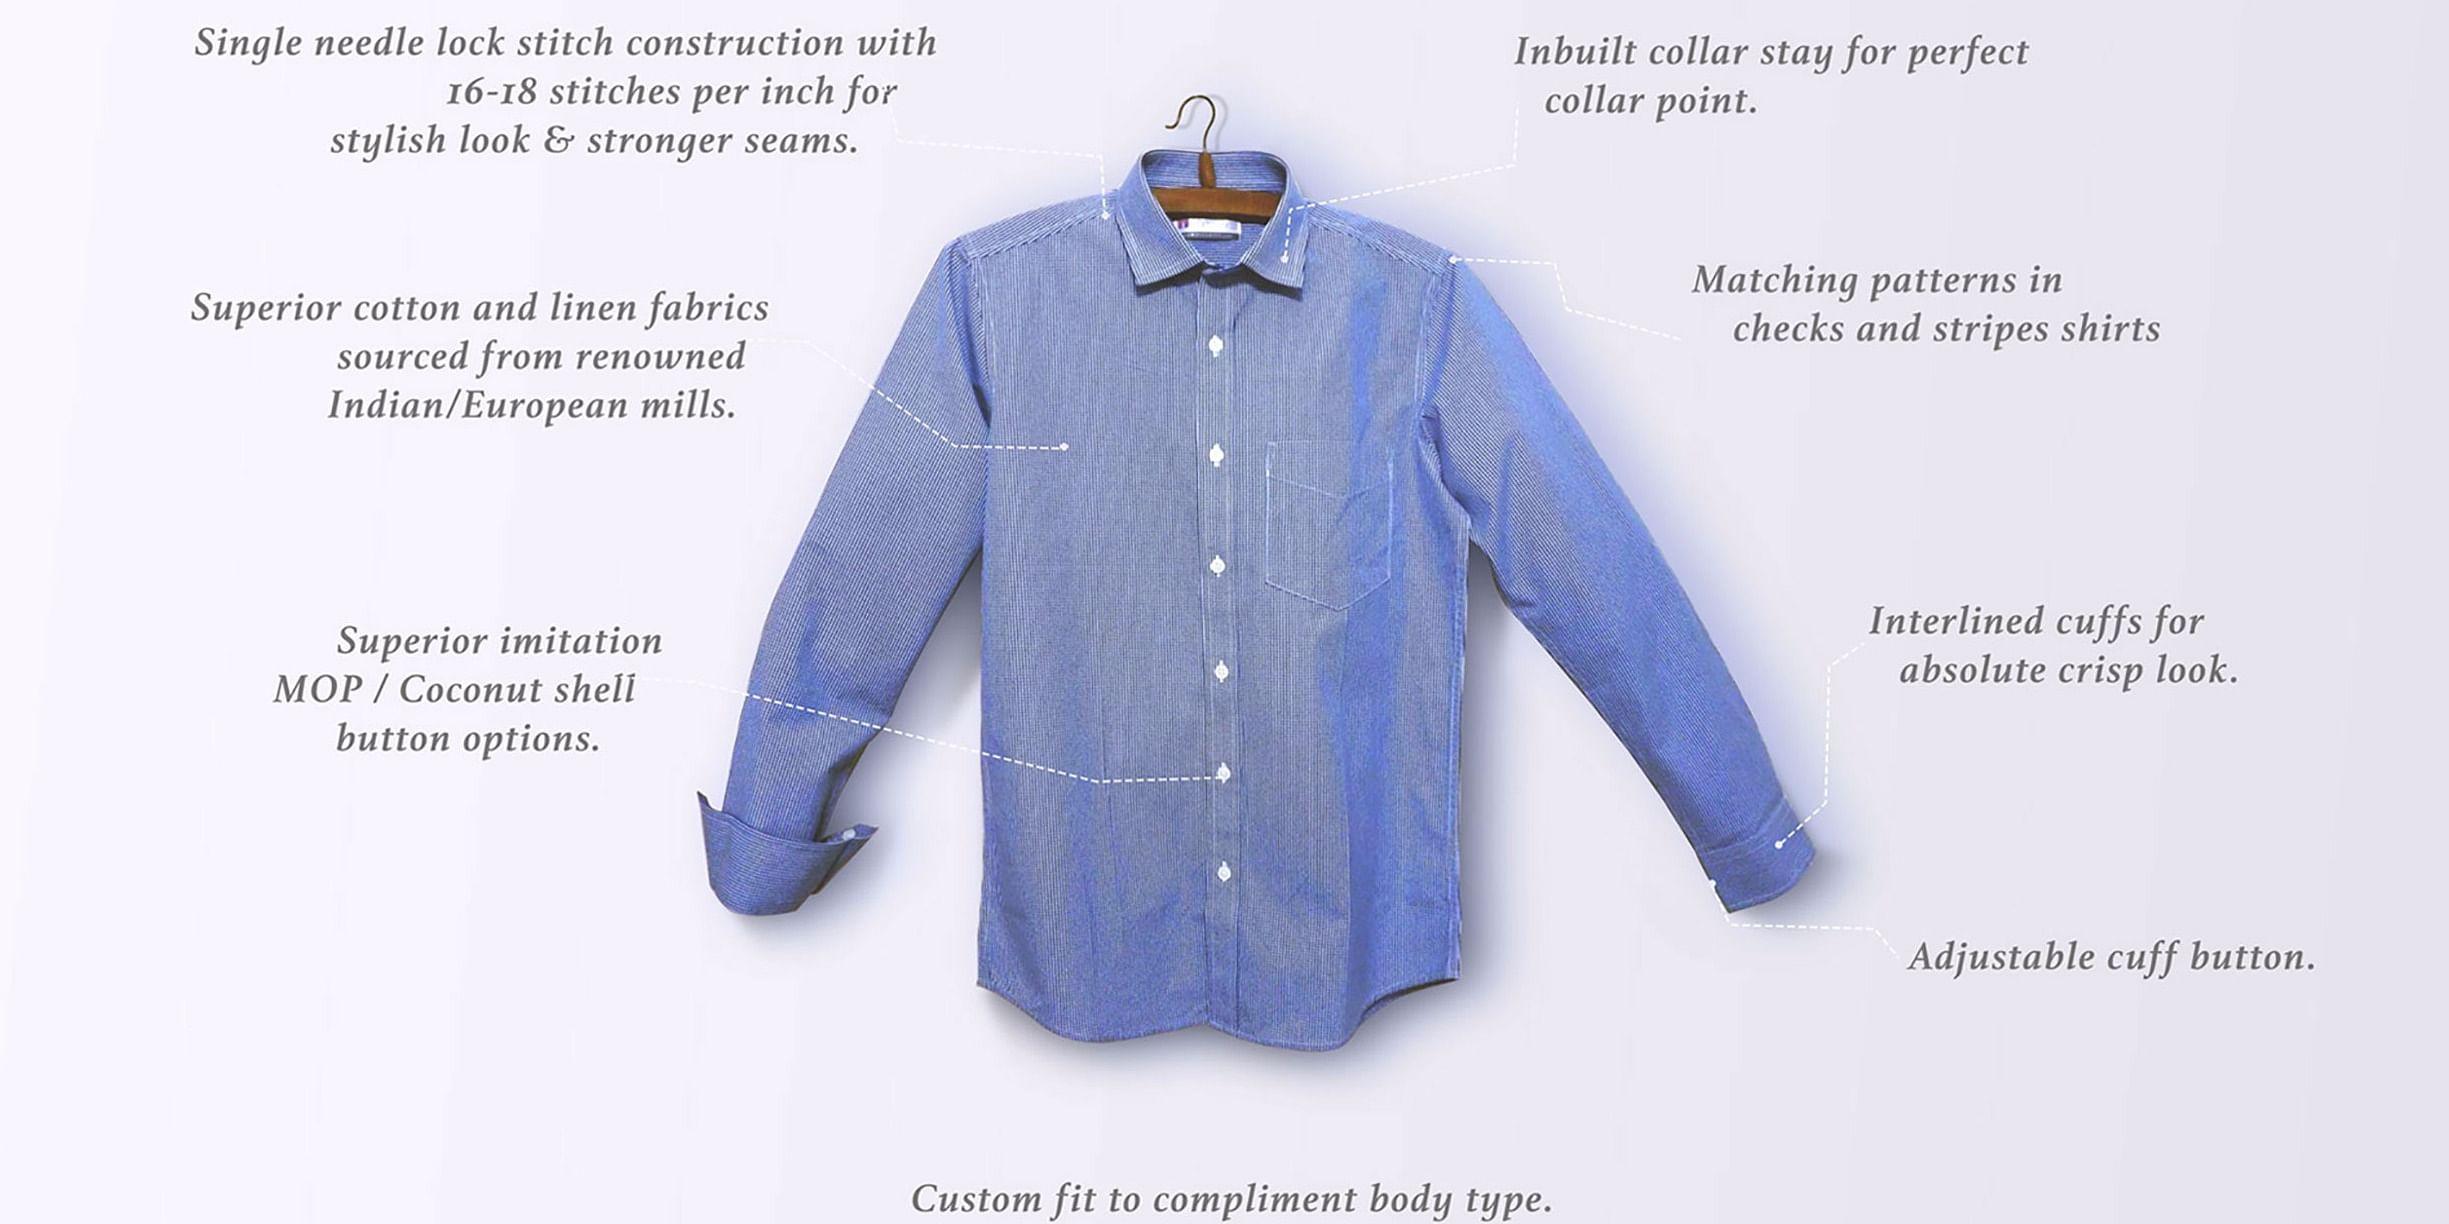 A StyleMyFit Shirt